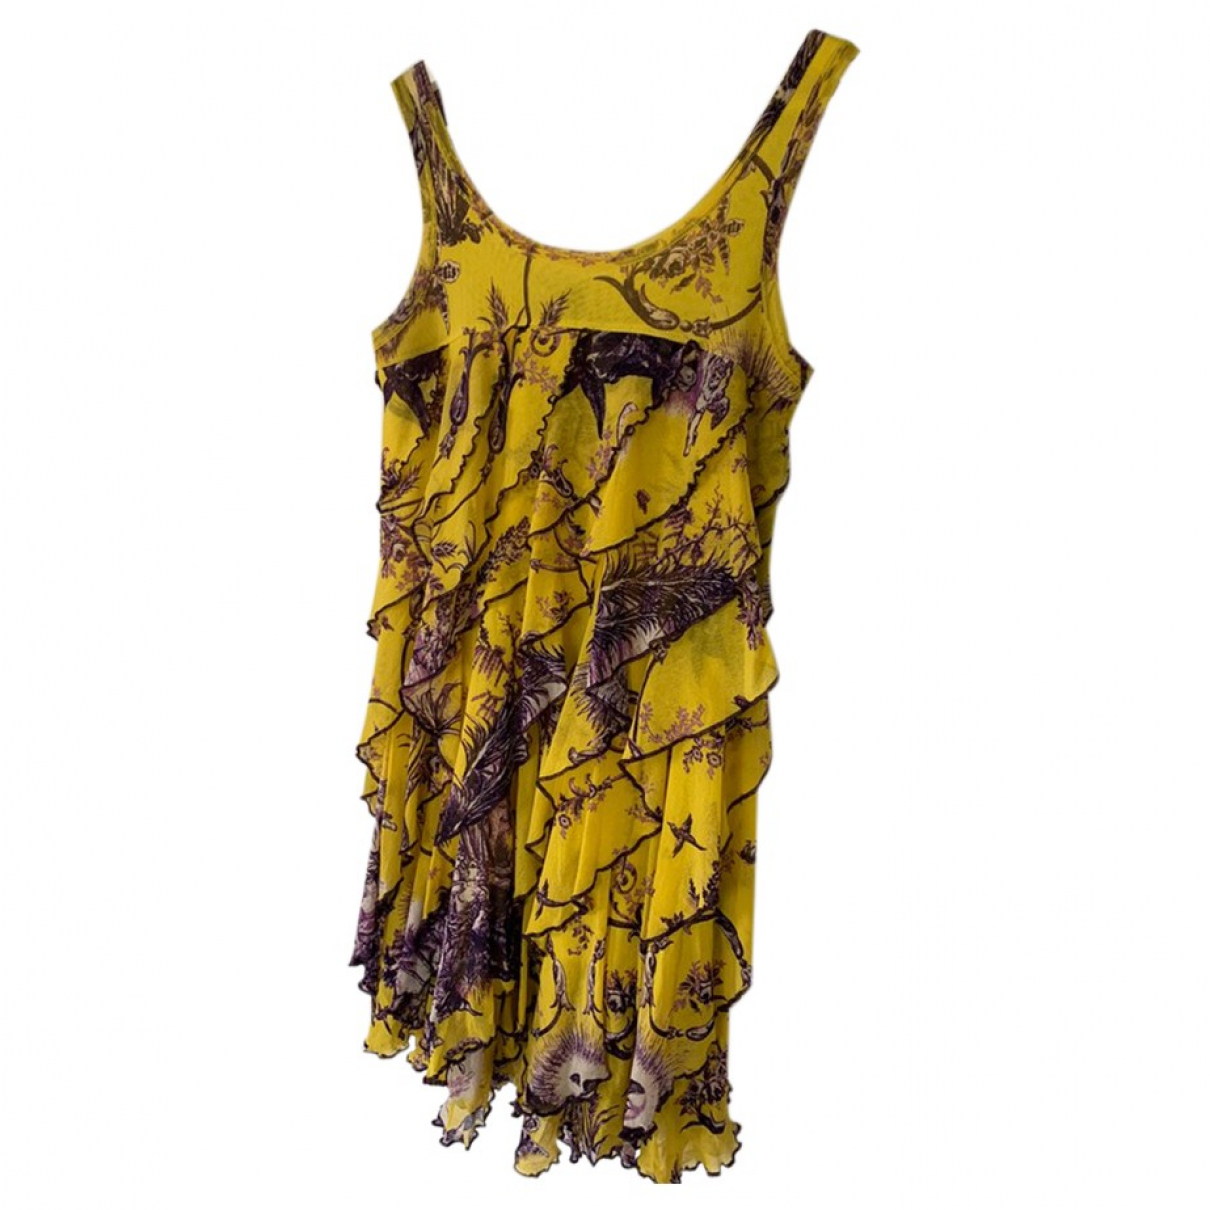 Jean Paul Gaultier \N Kleid in  Gelb Synthetik